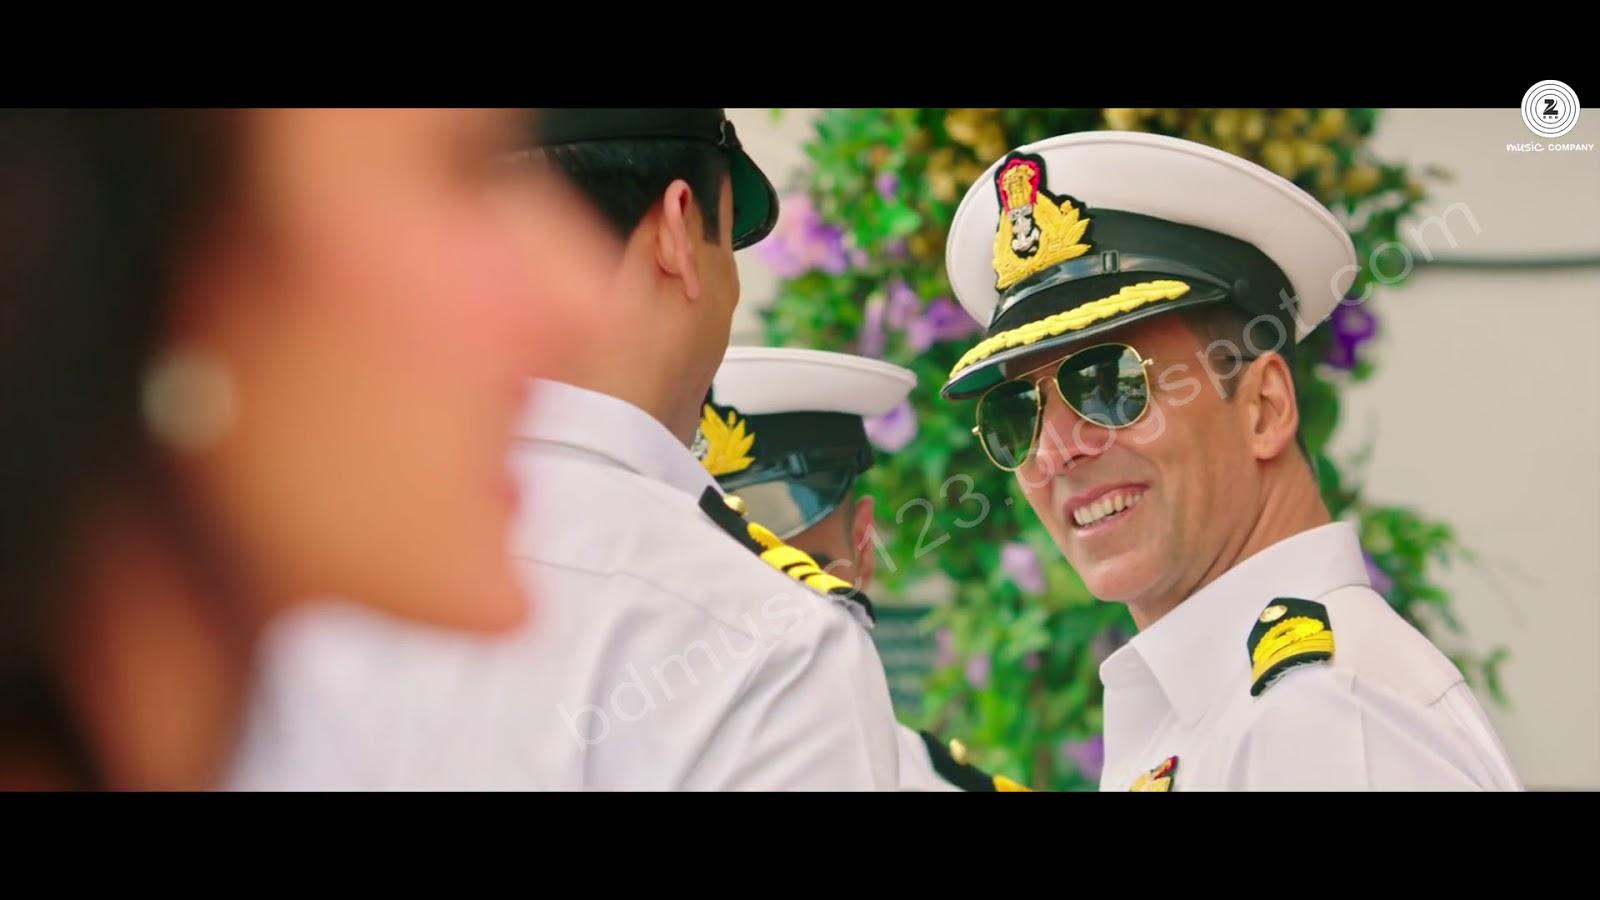 rustom movie hd akshay kumar download